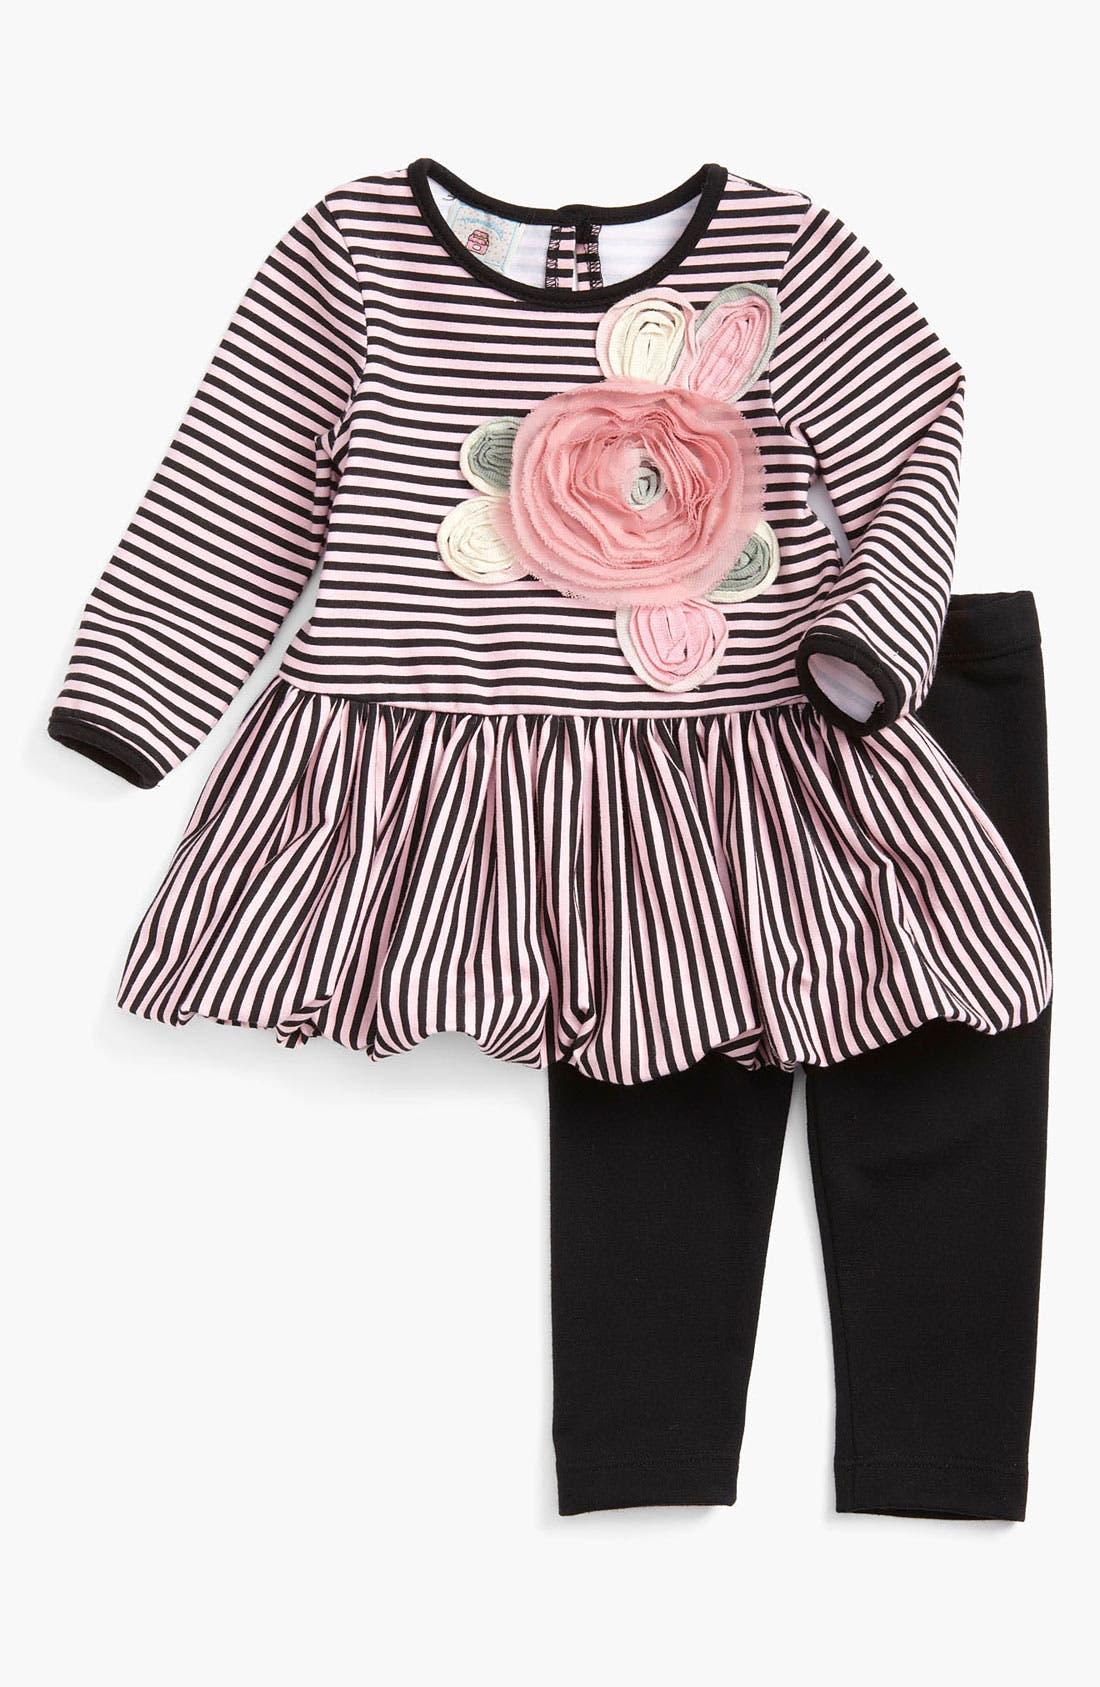 Main Image - Pippa & Julie Dress & Leggings (Infant)